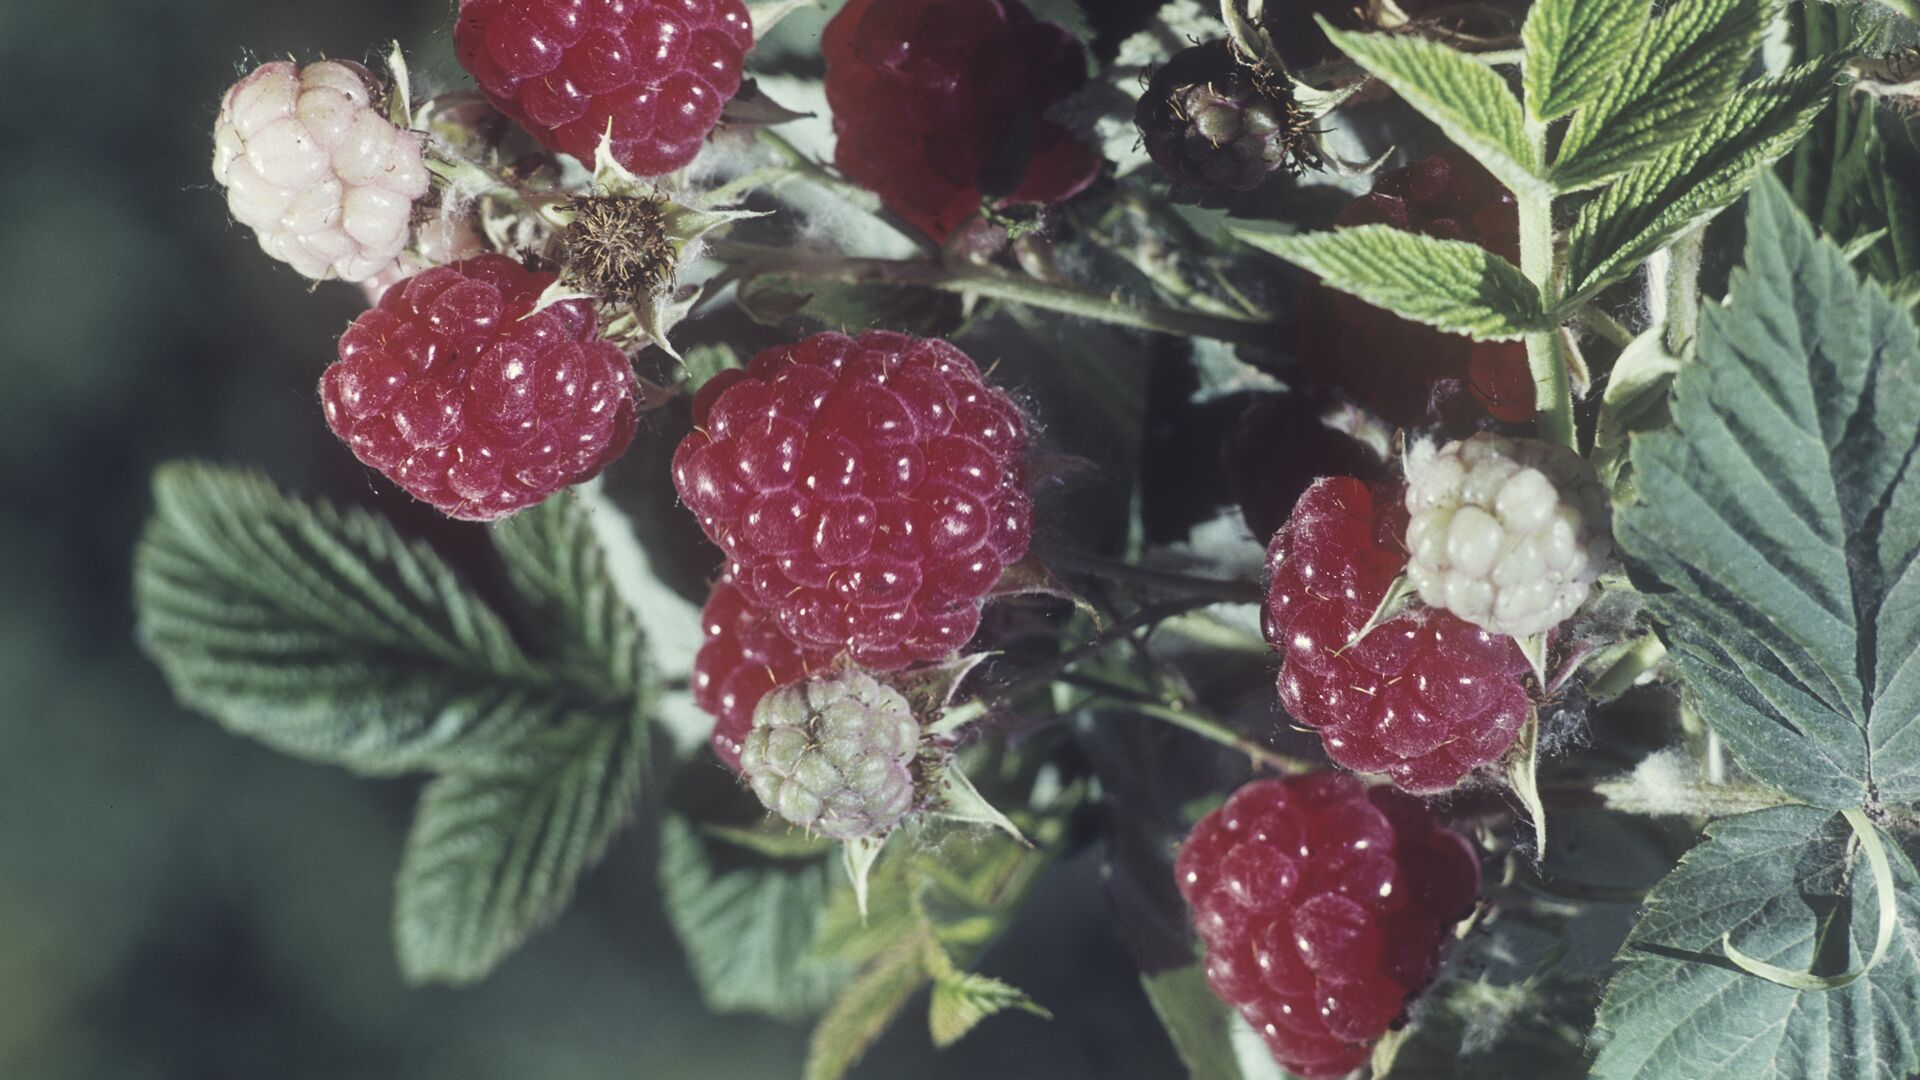 Малина (Rubus idaeus) - Sputnik Грузия, 1920, 28.09.2021